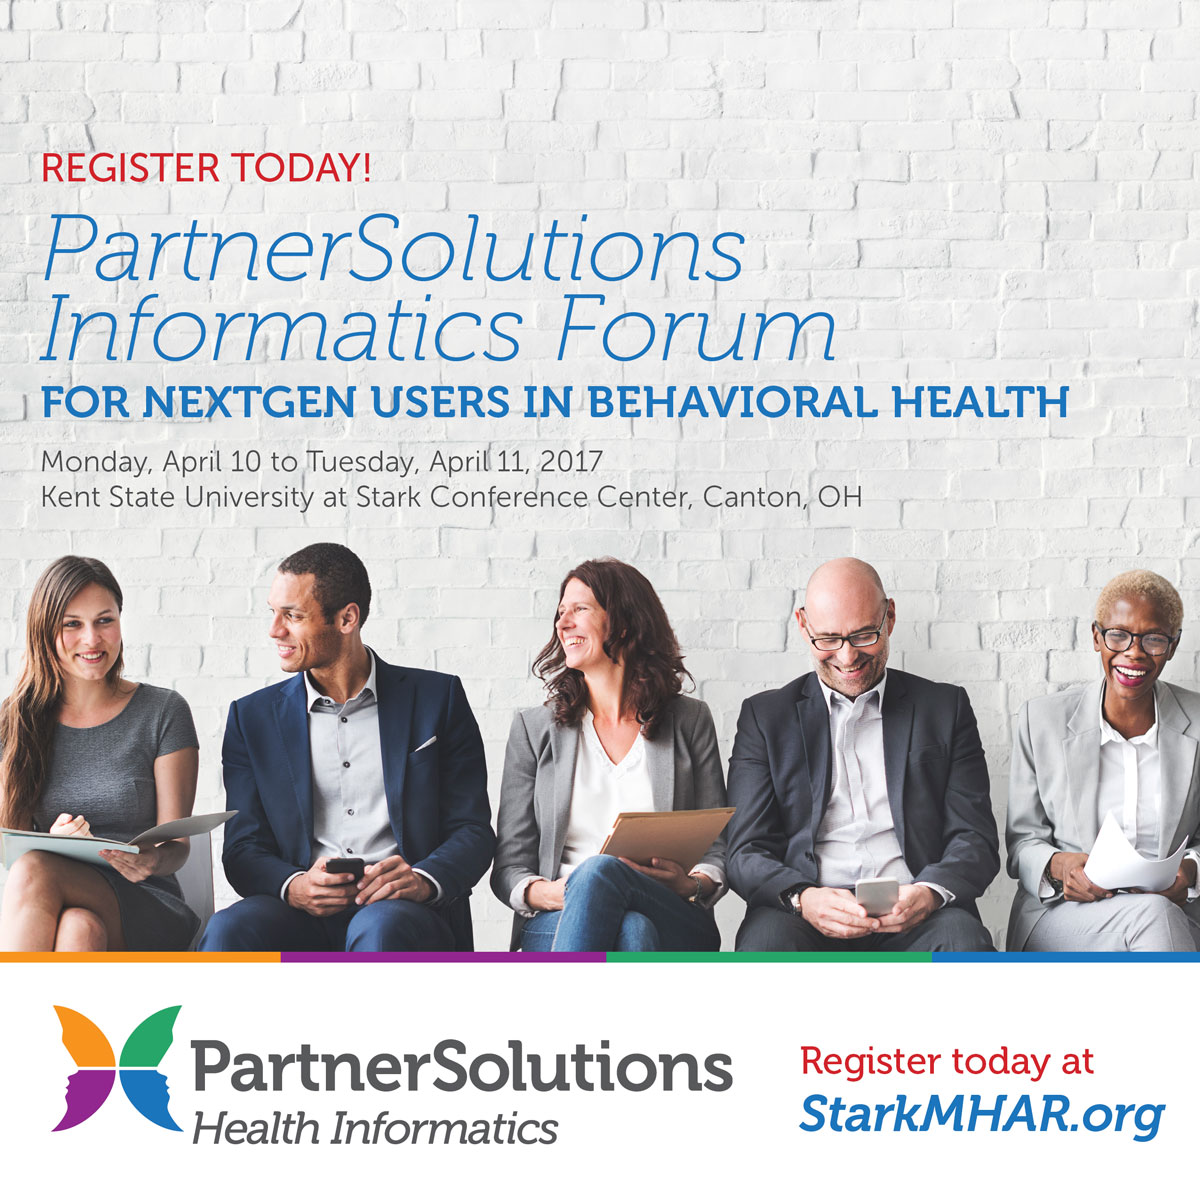 PartnerSolutions-event-300x300